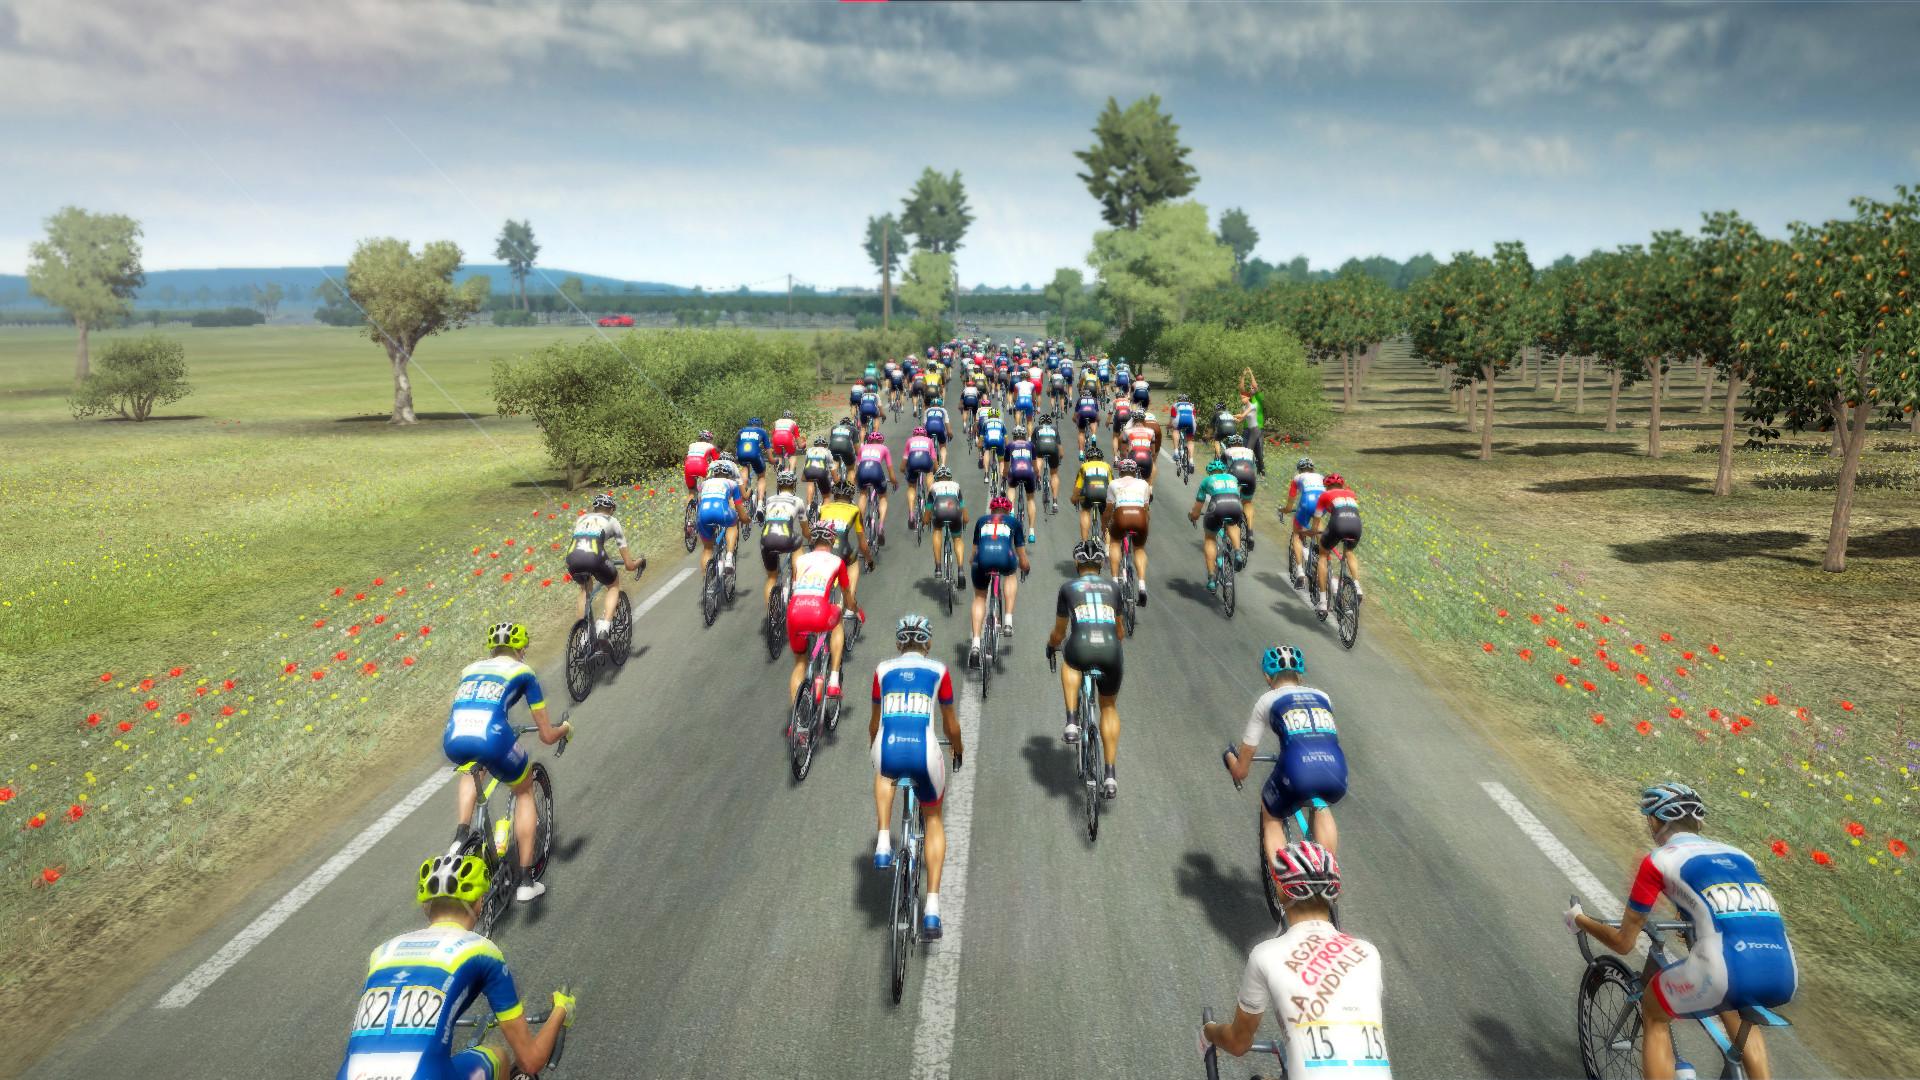 tour-de-france-2021-pc-screenshot-1